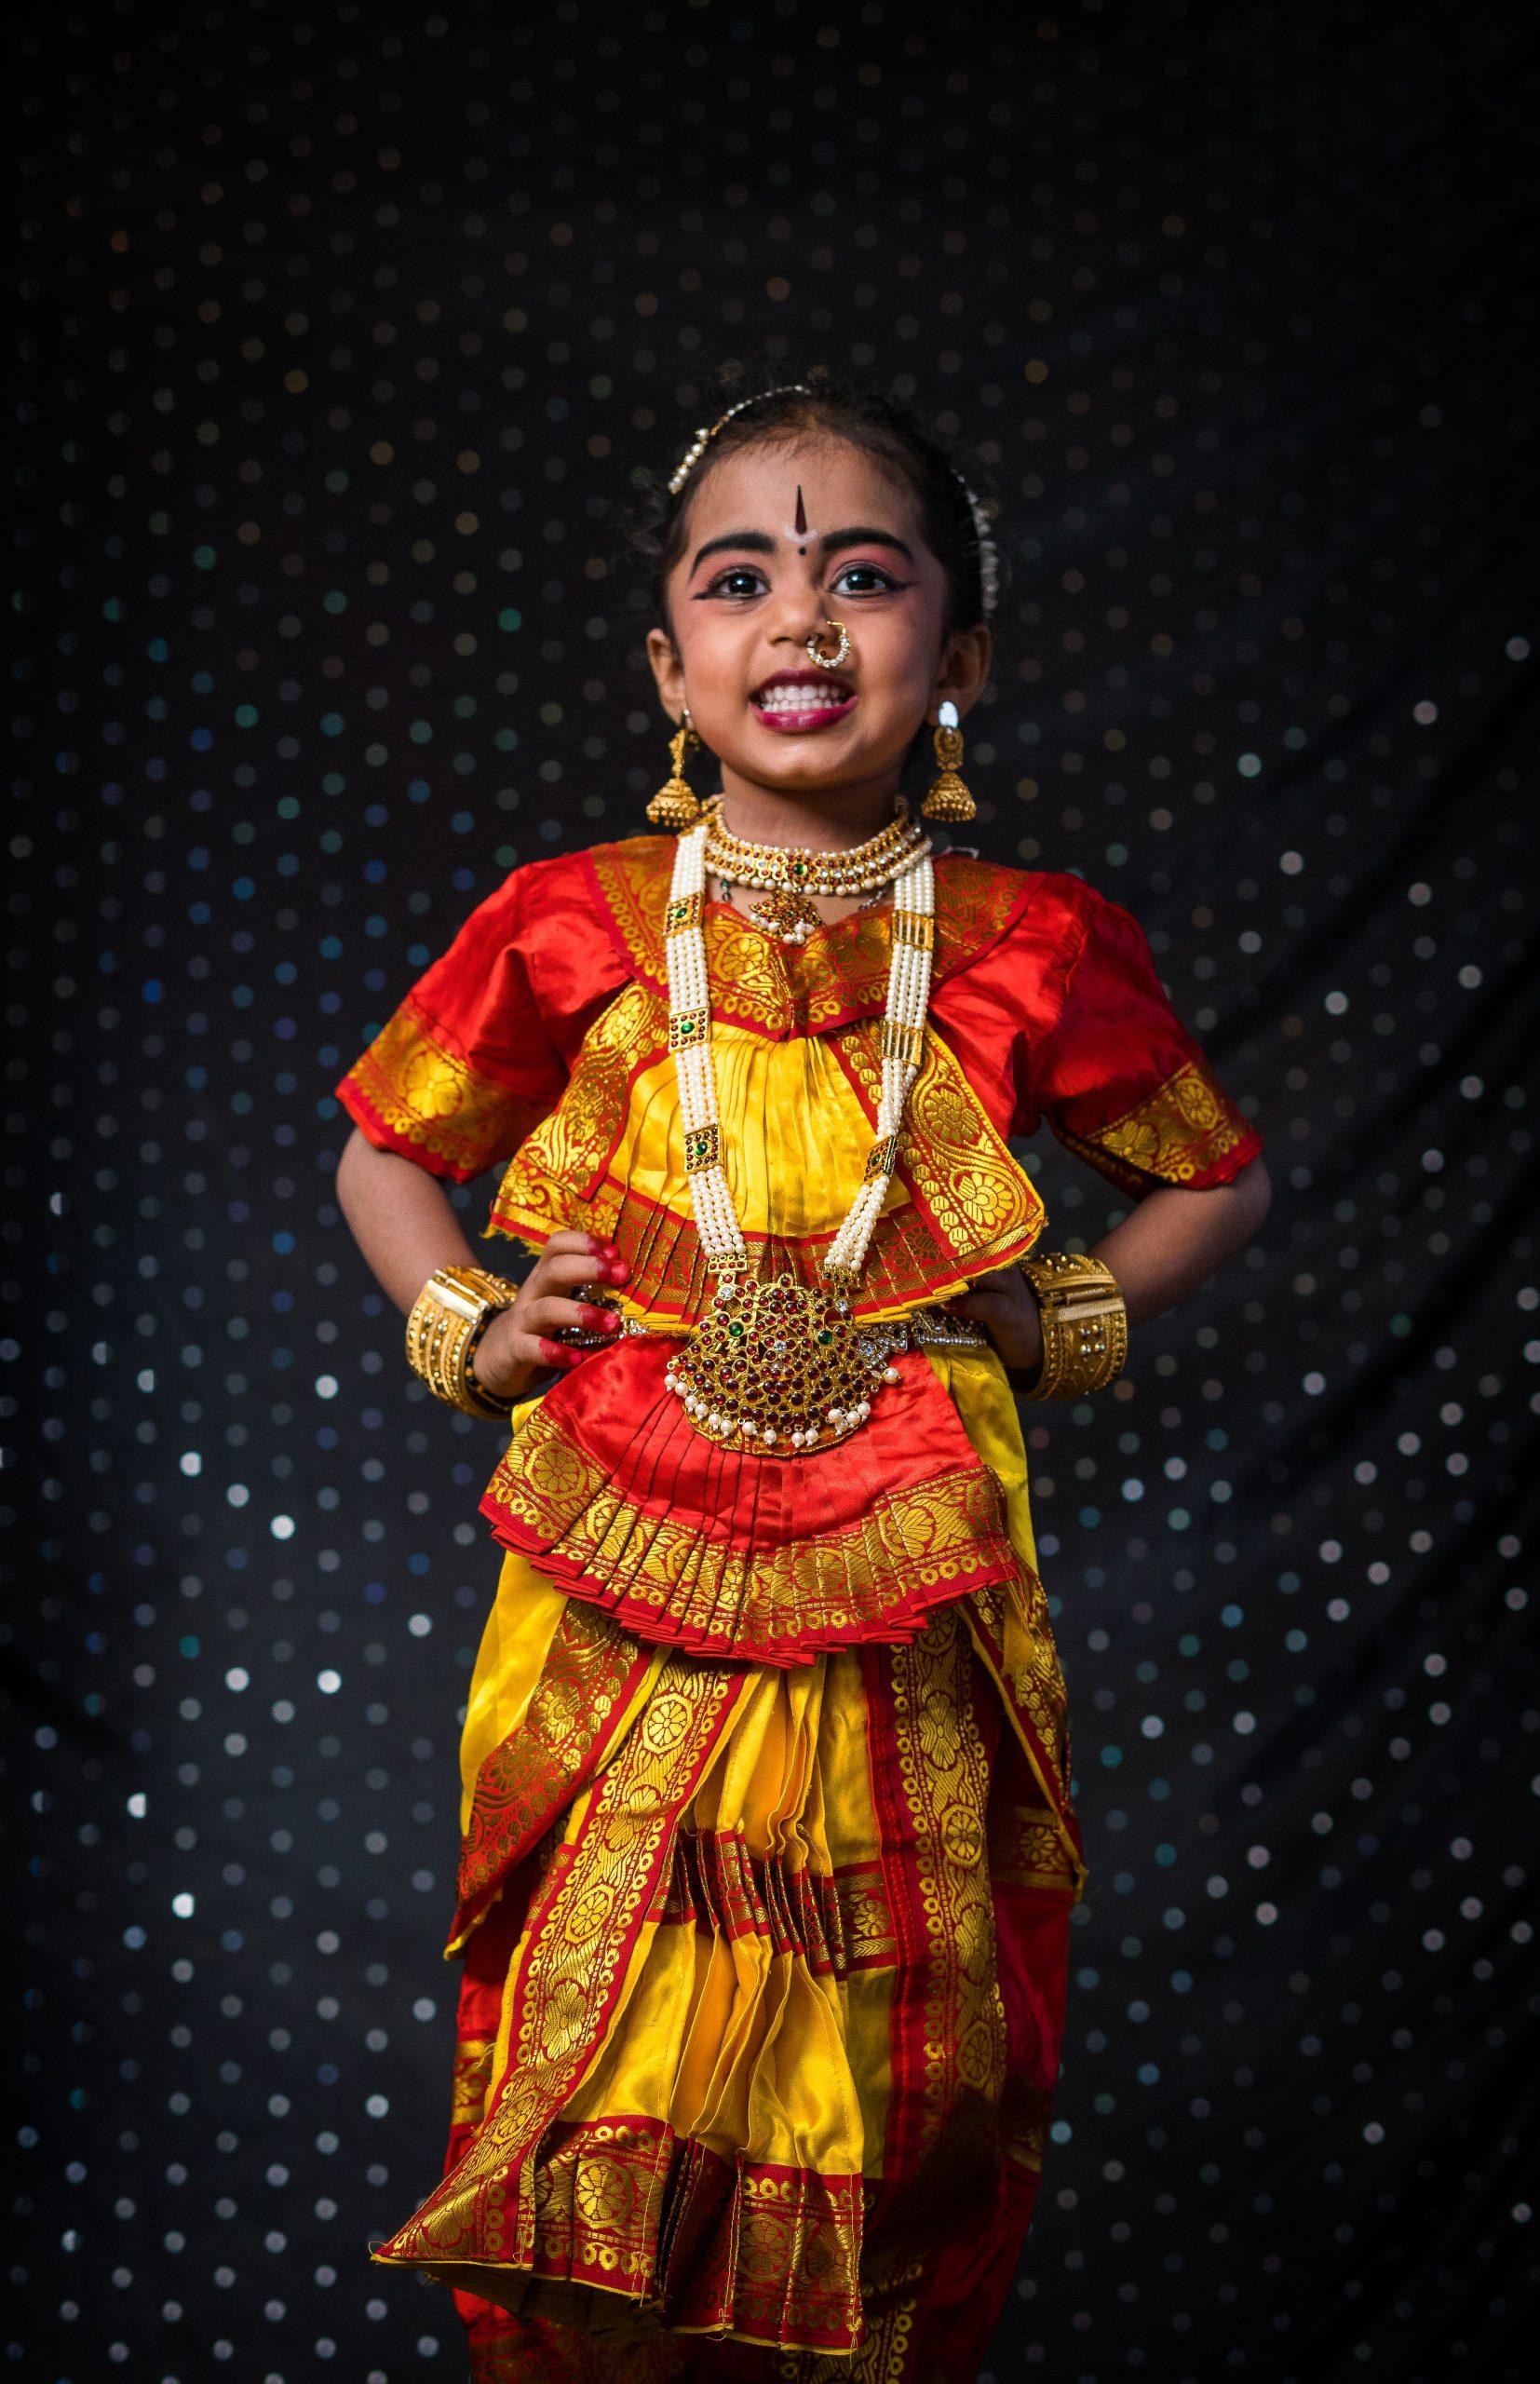 A little girl in dance makeover